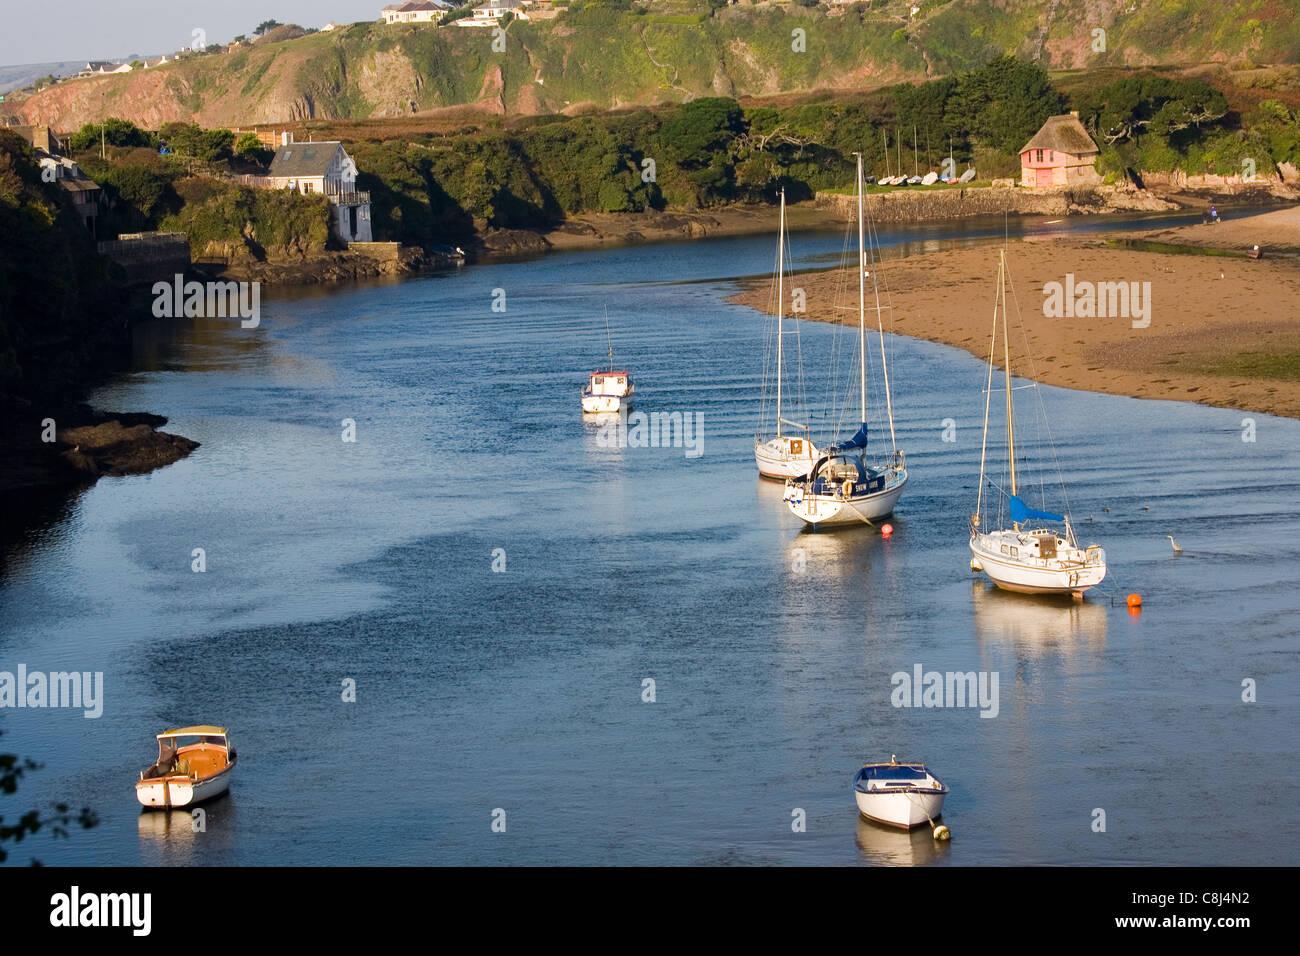 River Avon at Bantham in the South Hams, Devon - Stock Image